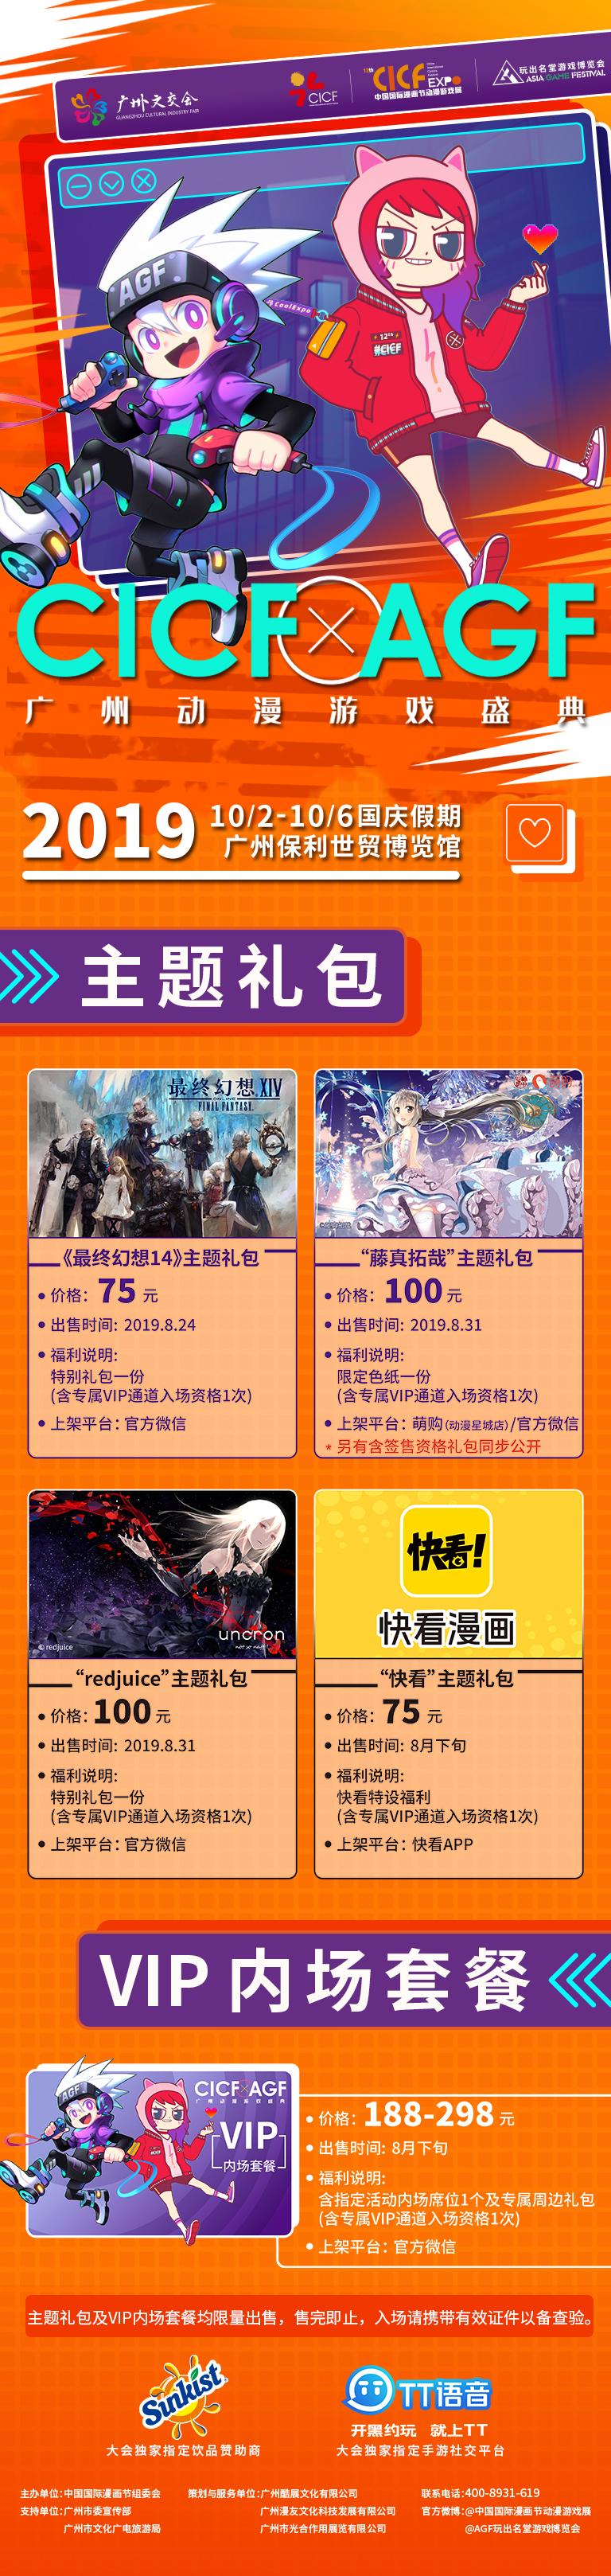 CICF×AGF 2019预售票开售,专属福利情报大放送!-ANICOGA